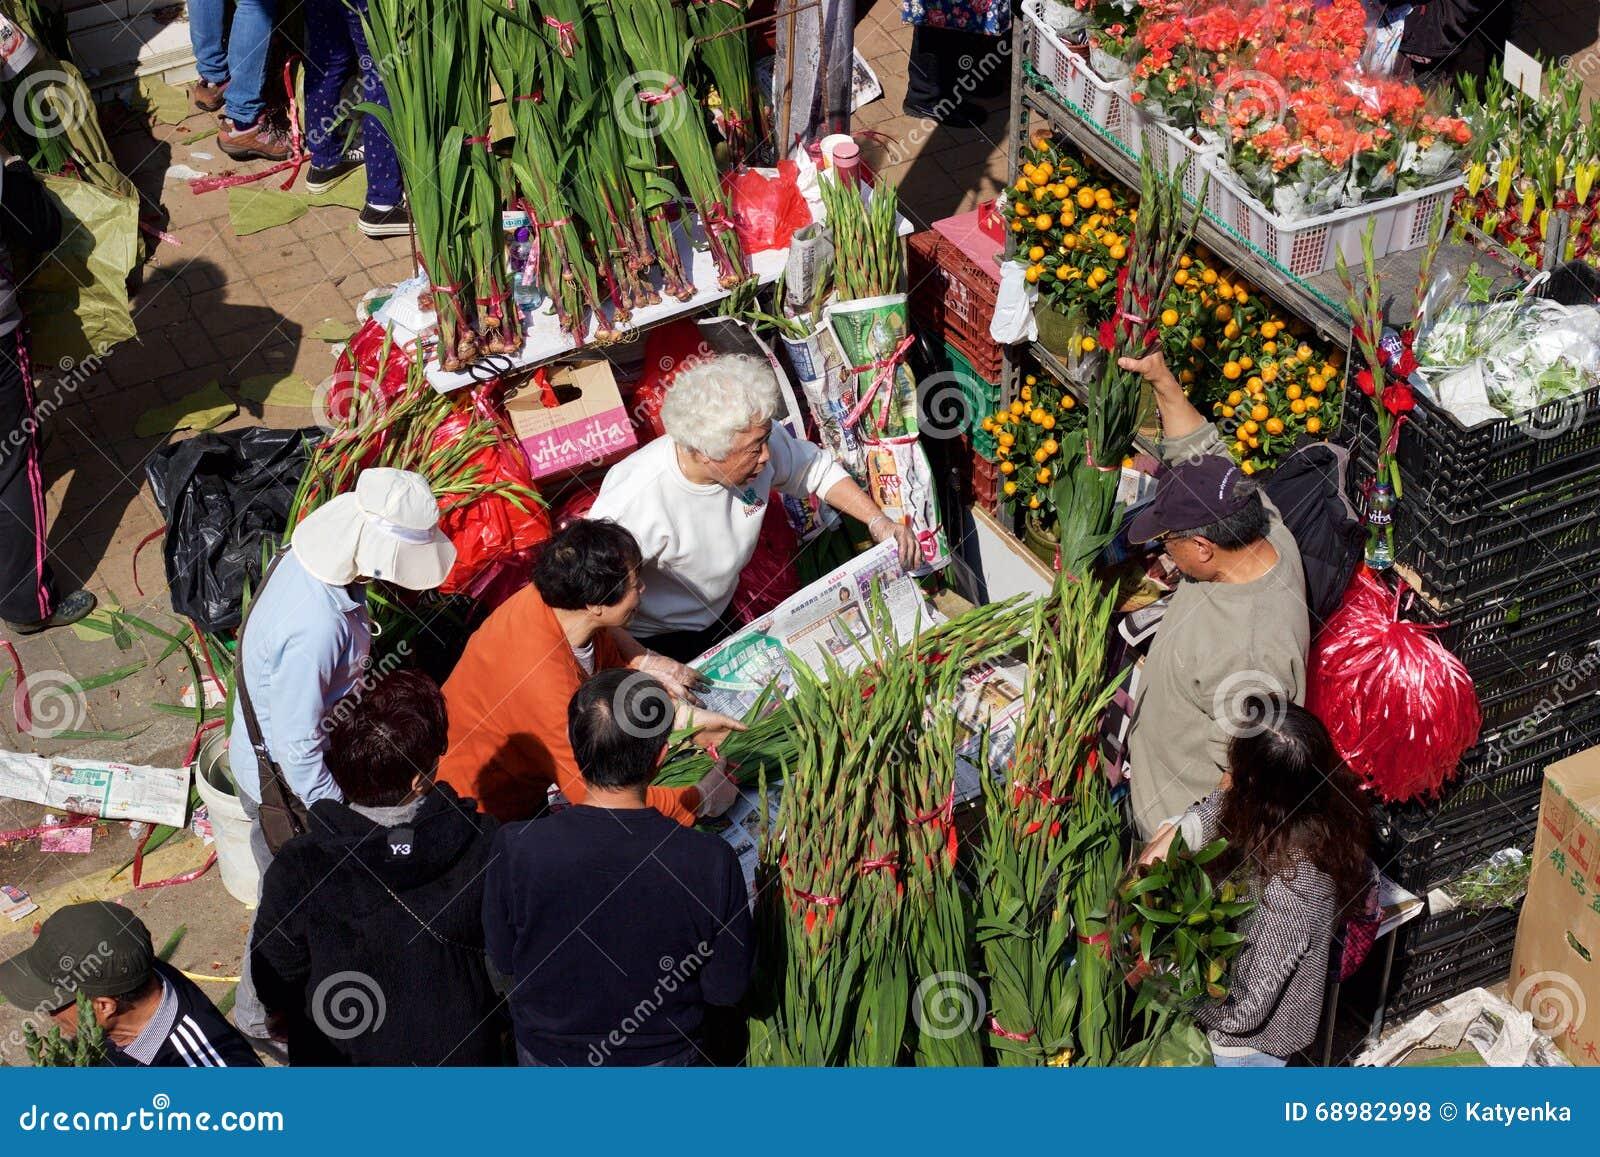 Año Nuevo chino: Vendedor de Hong Kong Flower Market que vende ramos